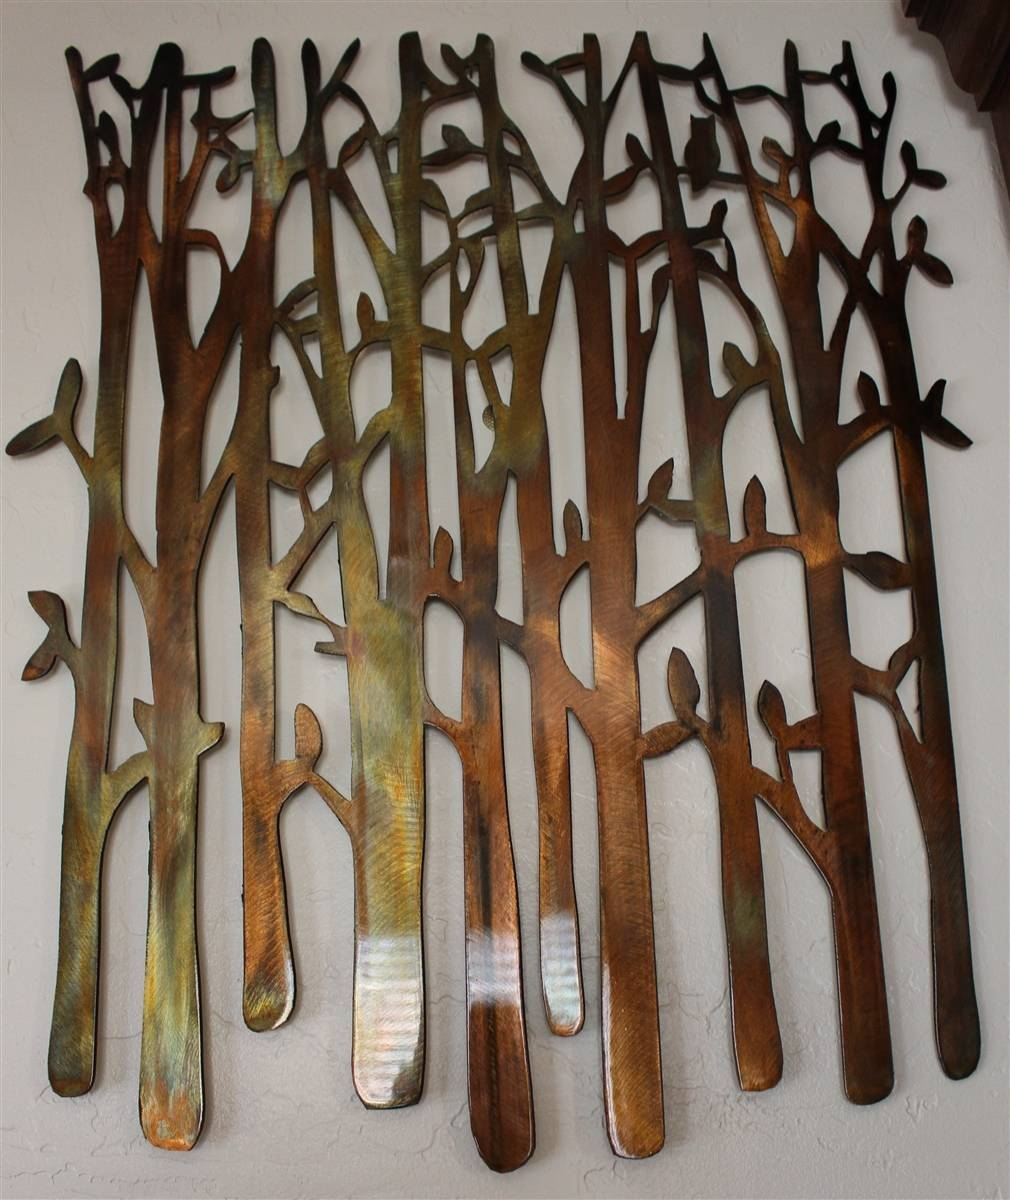 Birch Tree, Birch Tree Metal Art, Bamboo, Bird In The Trees, Bird With Regard To Most Up To Date Bird Metal Wall Art (View 2 of 20)